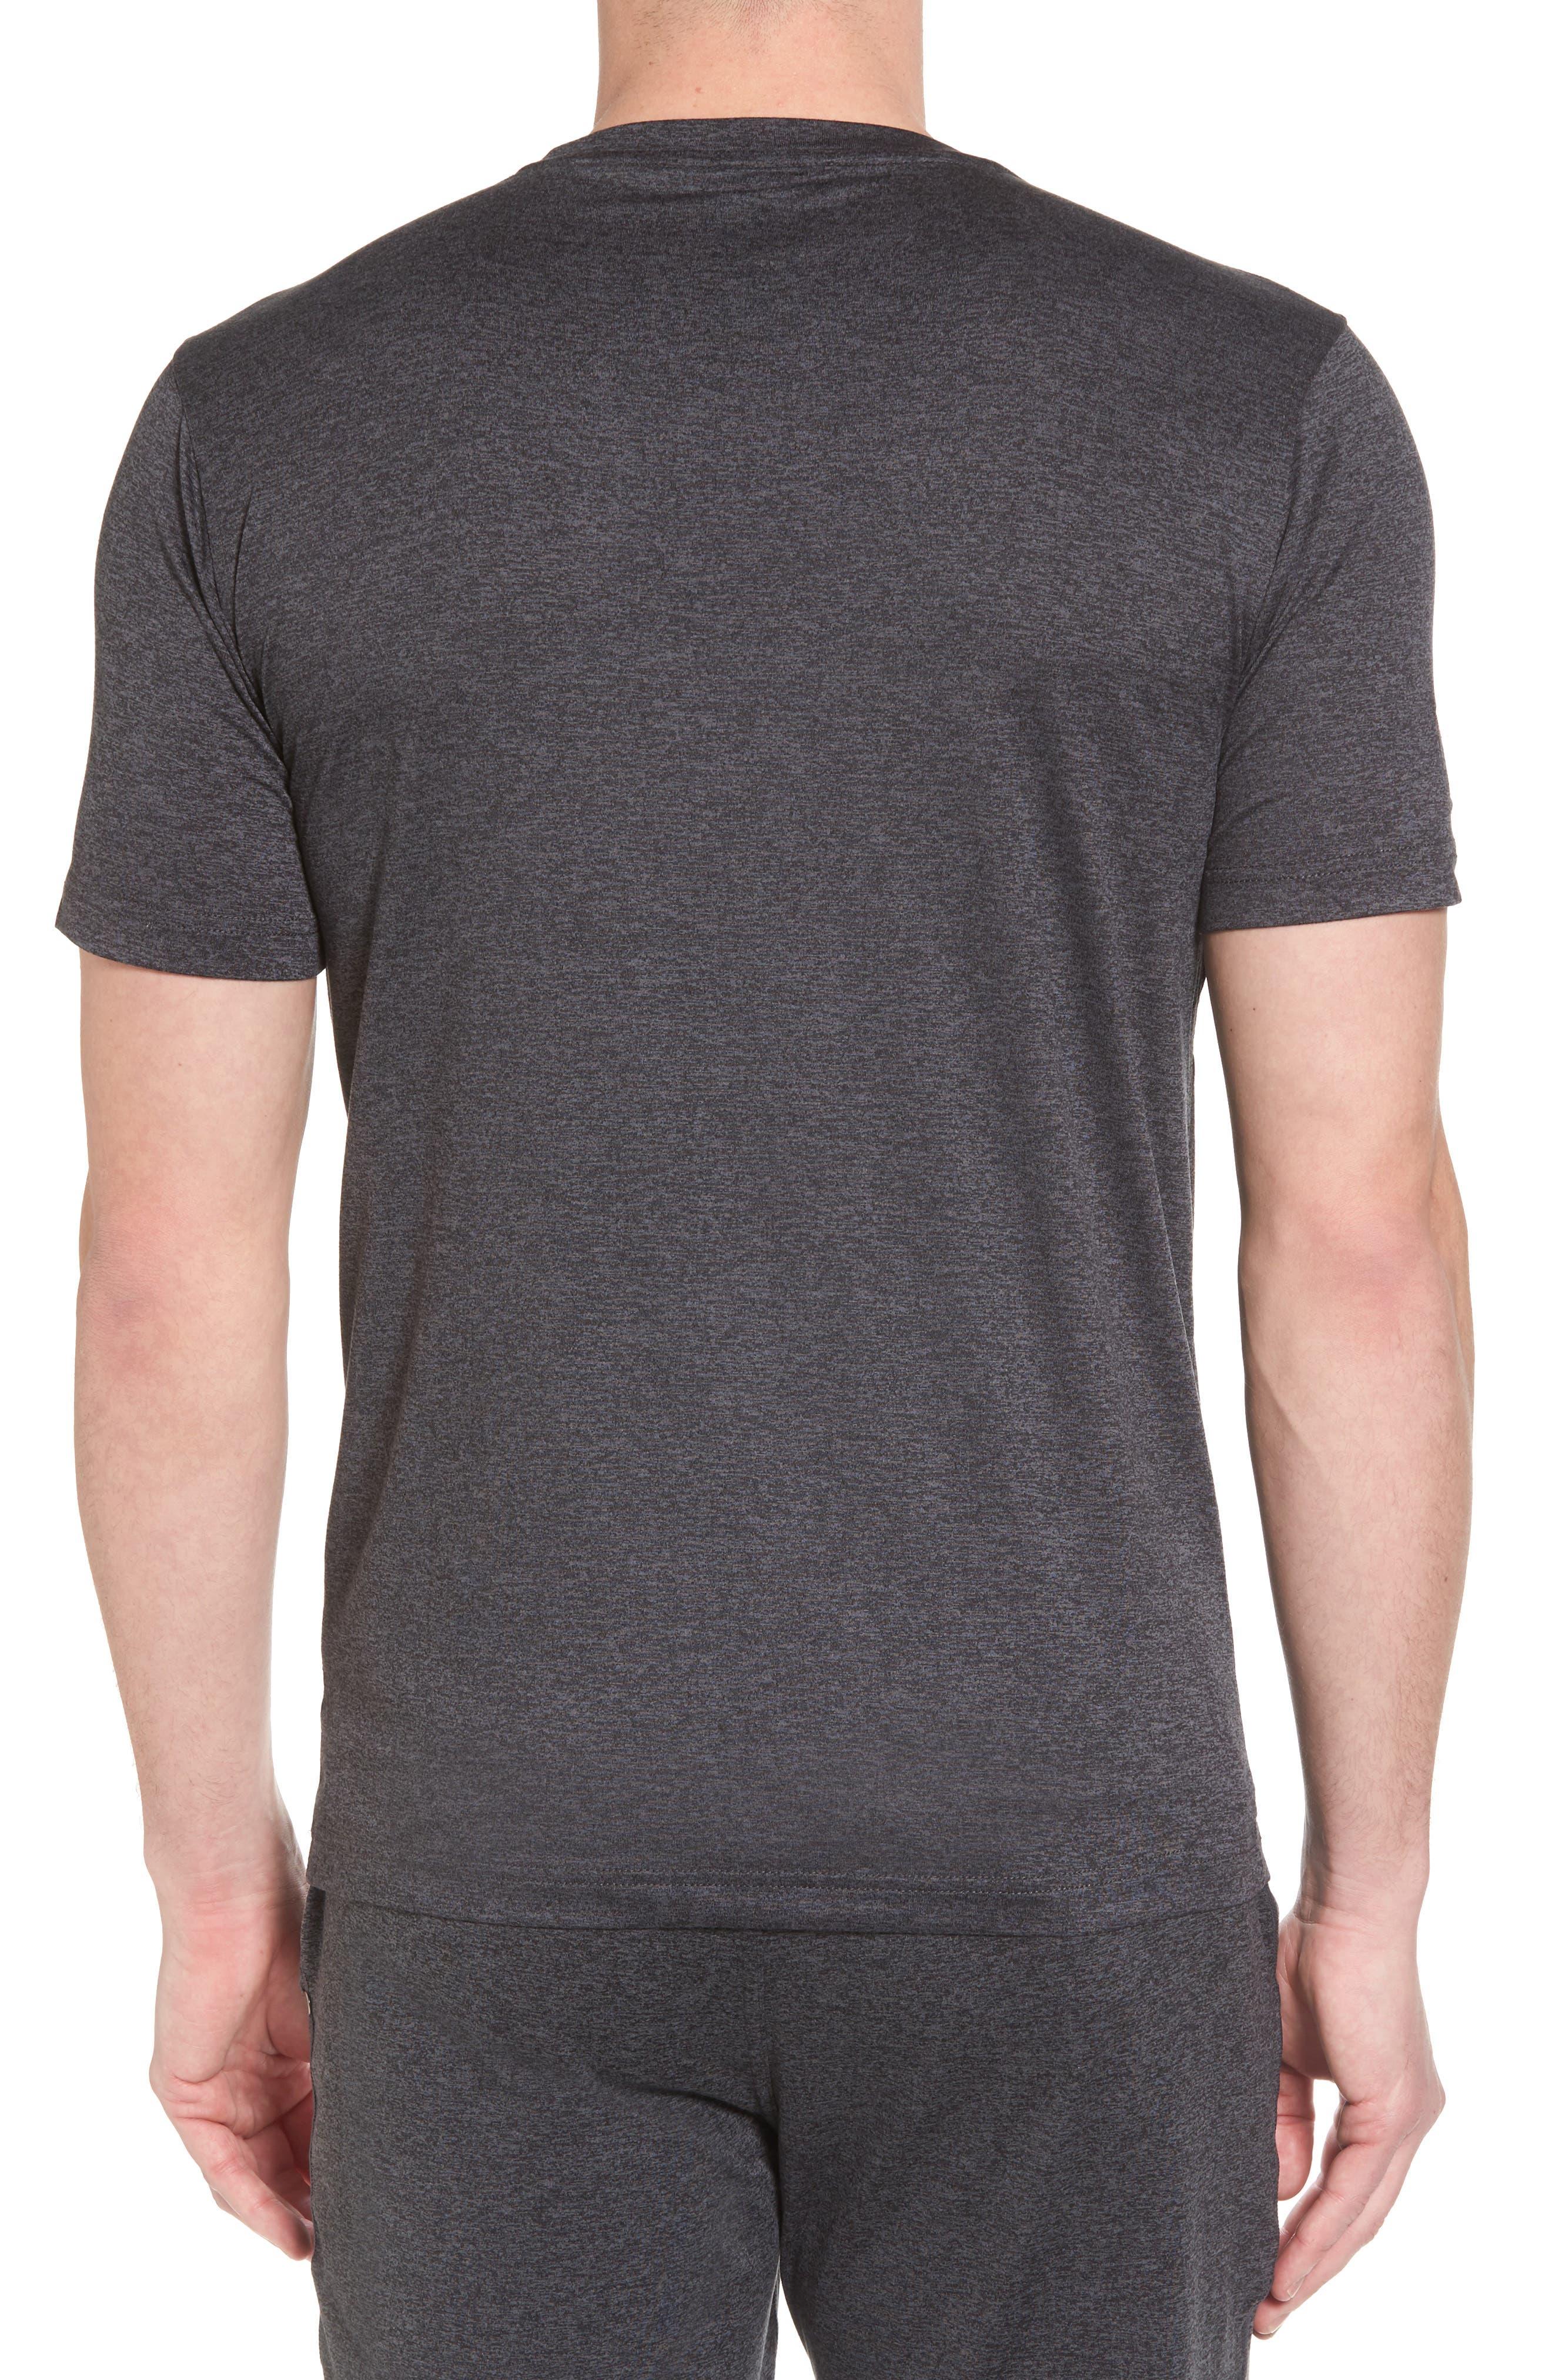 Alternate Image 2  - Vuori Strato Slim Fit Crewneck T-Shirt